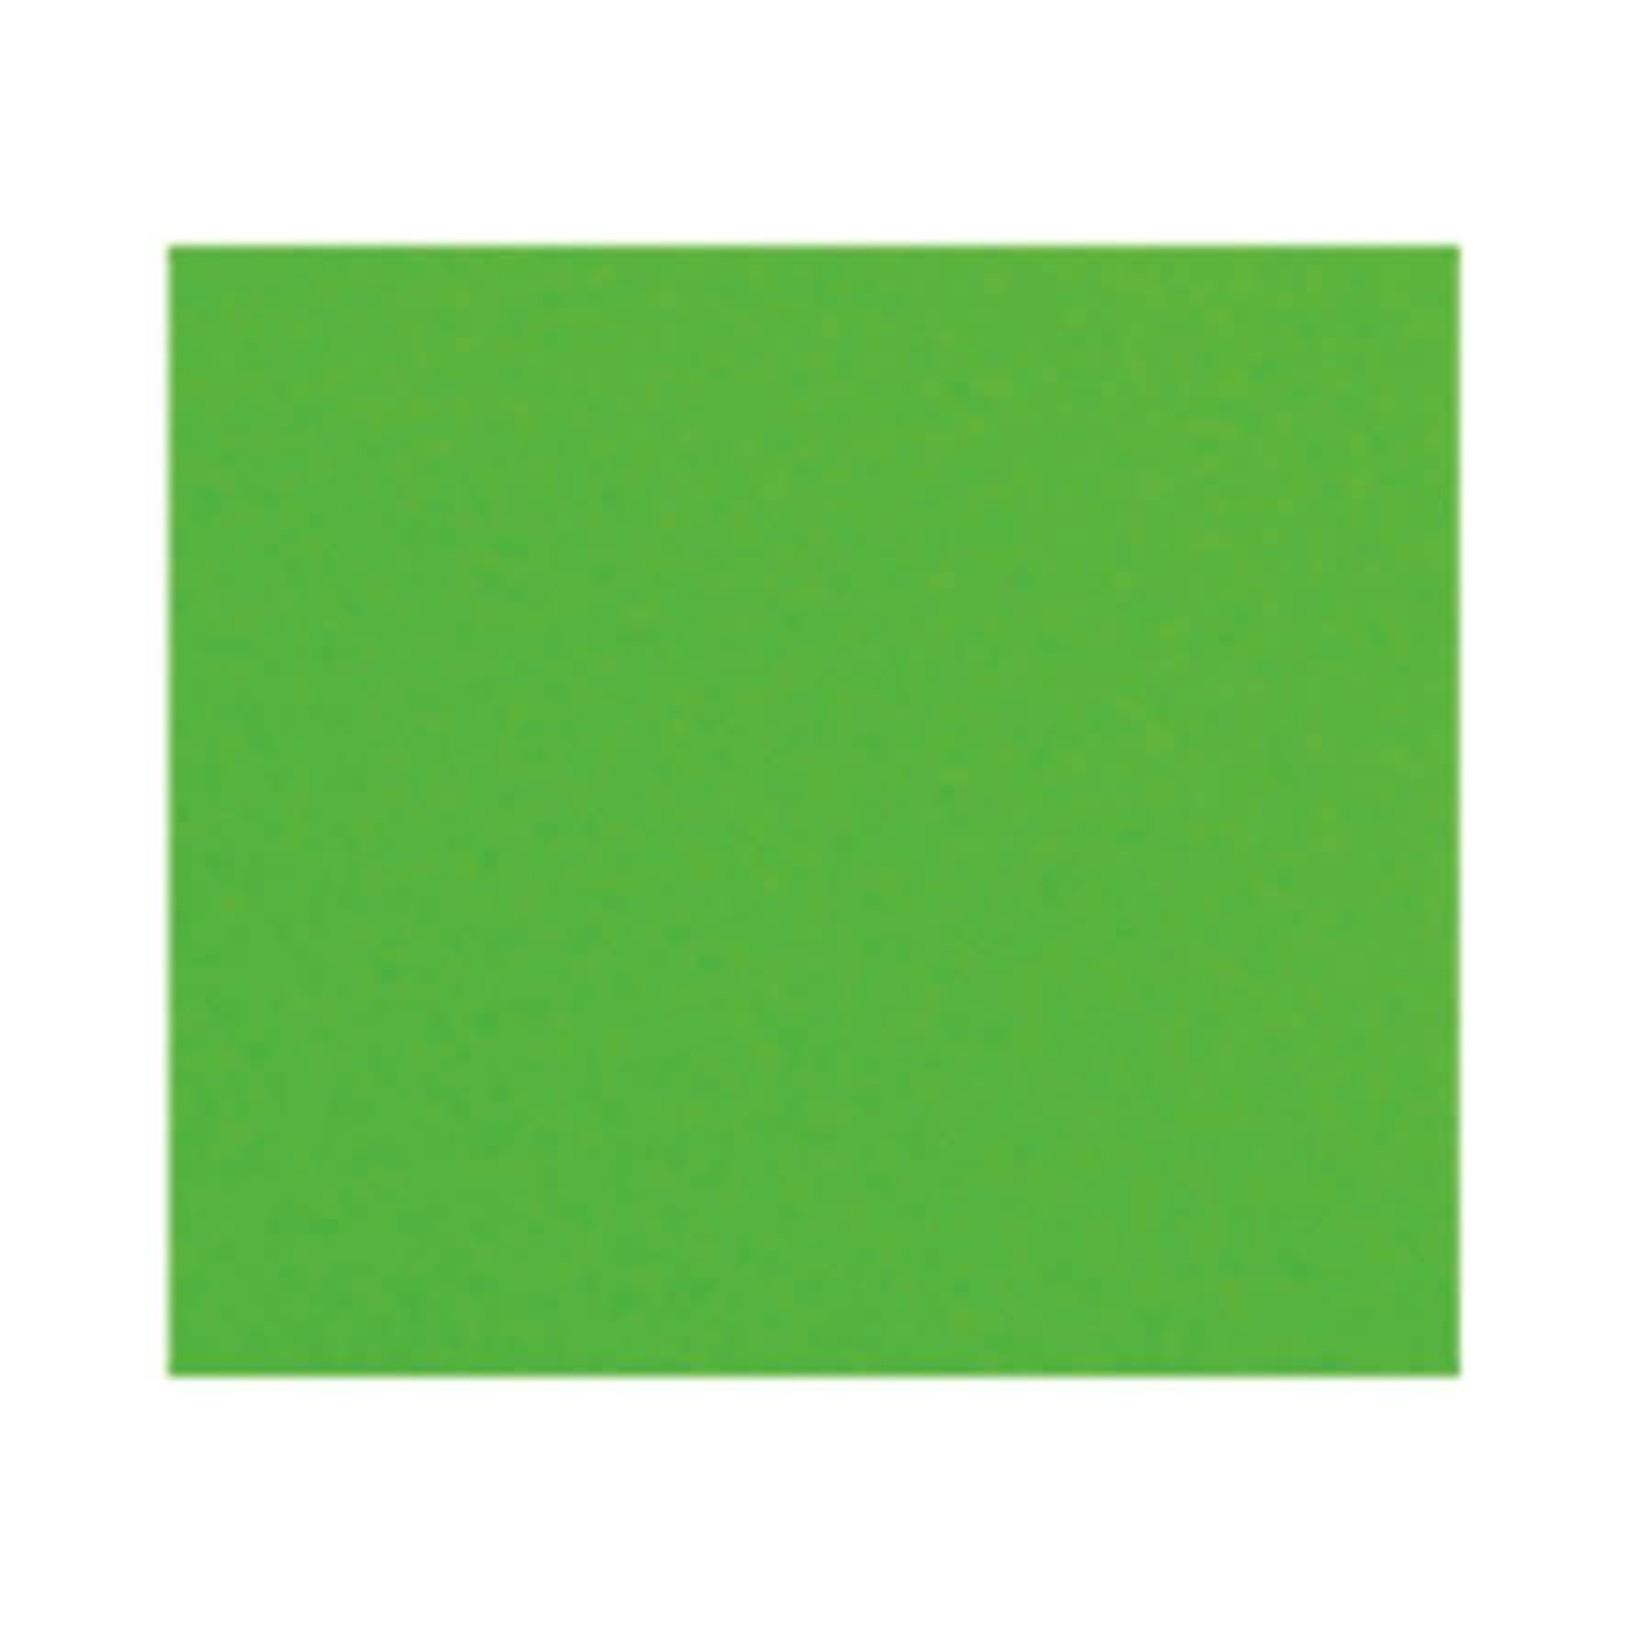 Evo Classic, Guidoline, Vert Lime